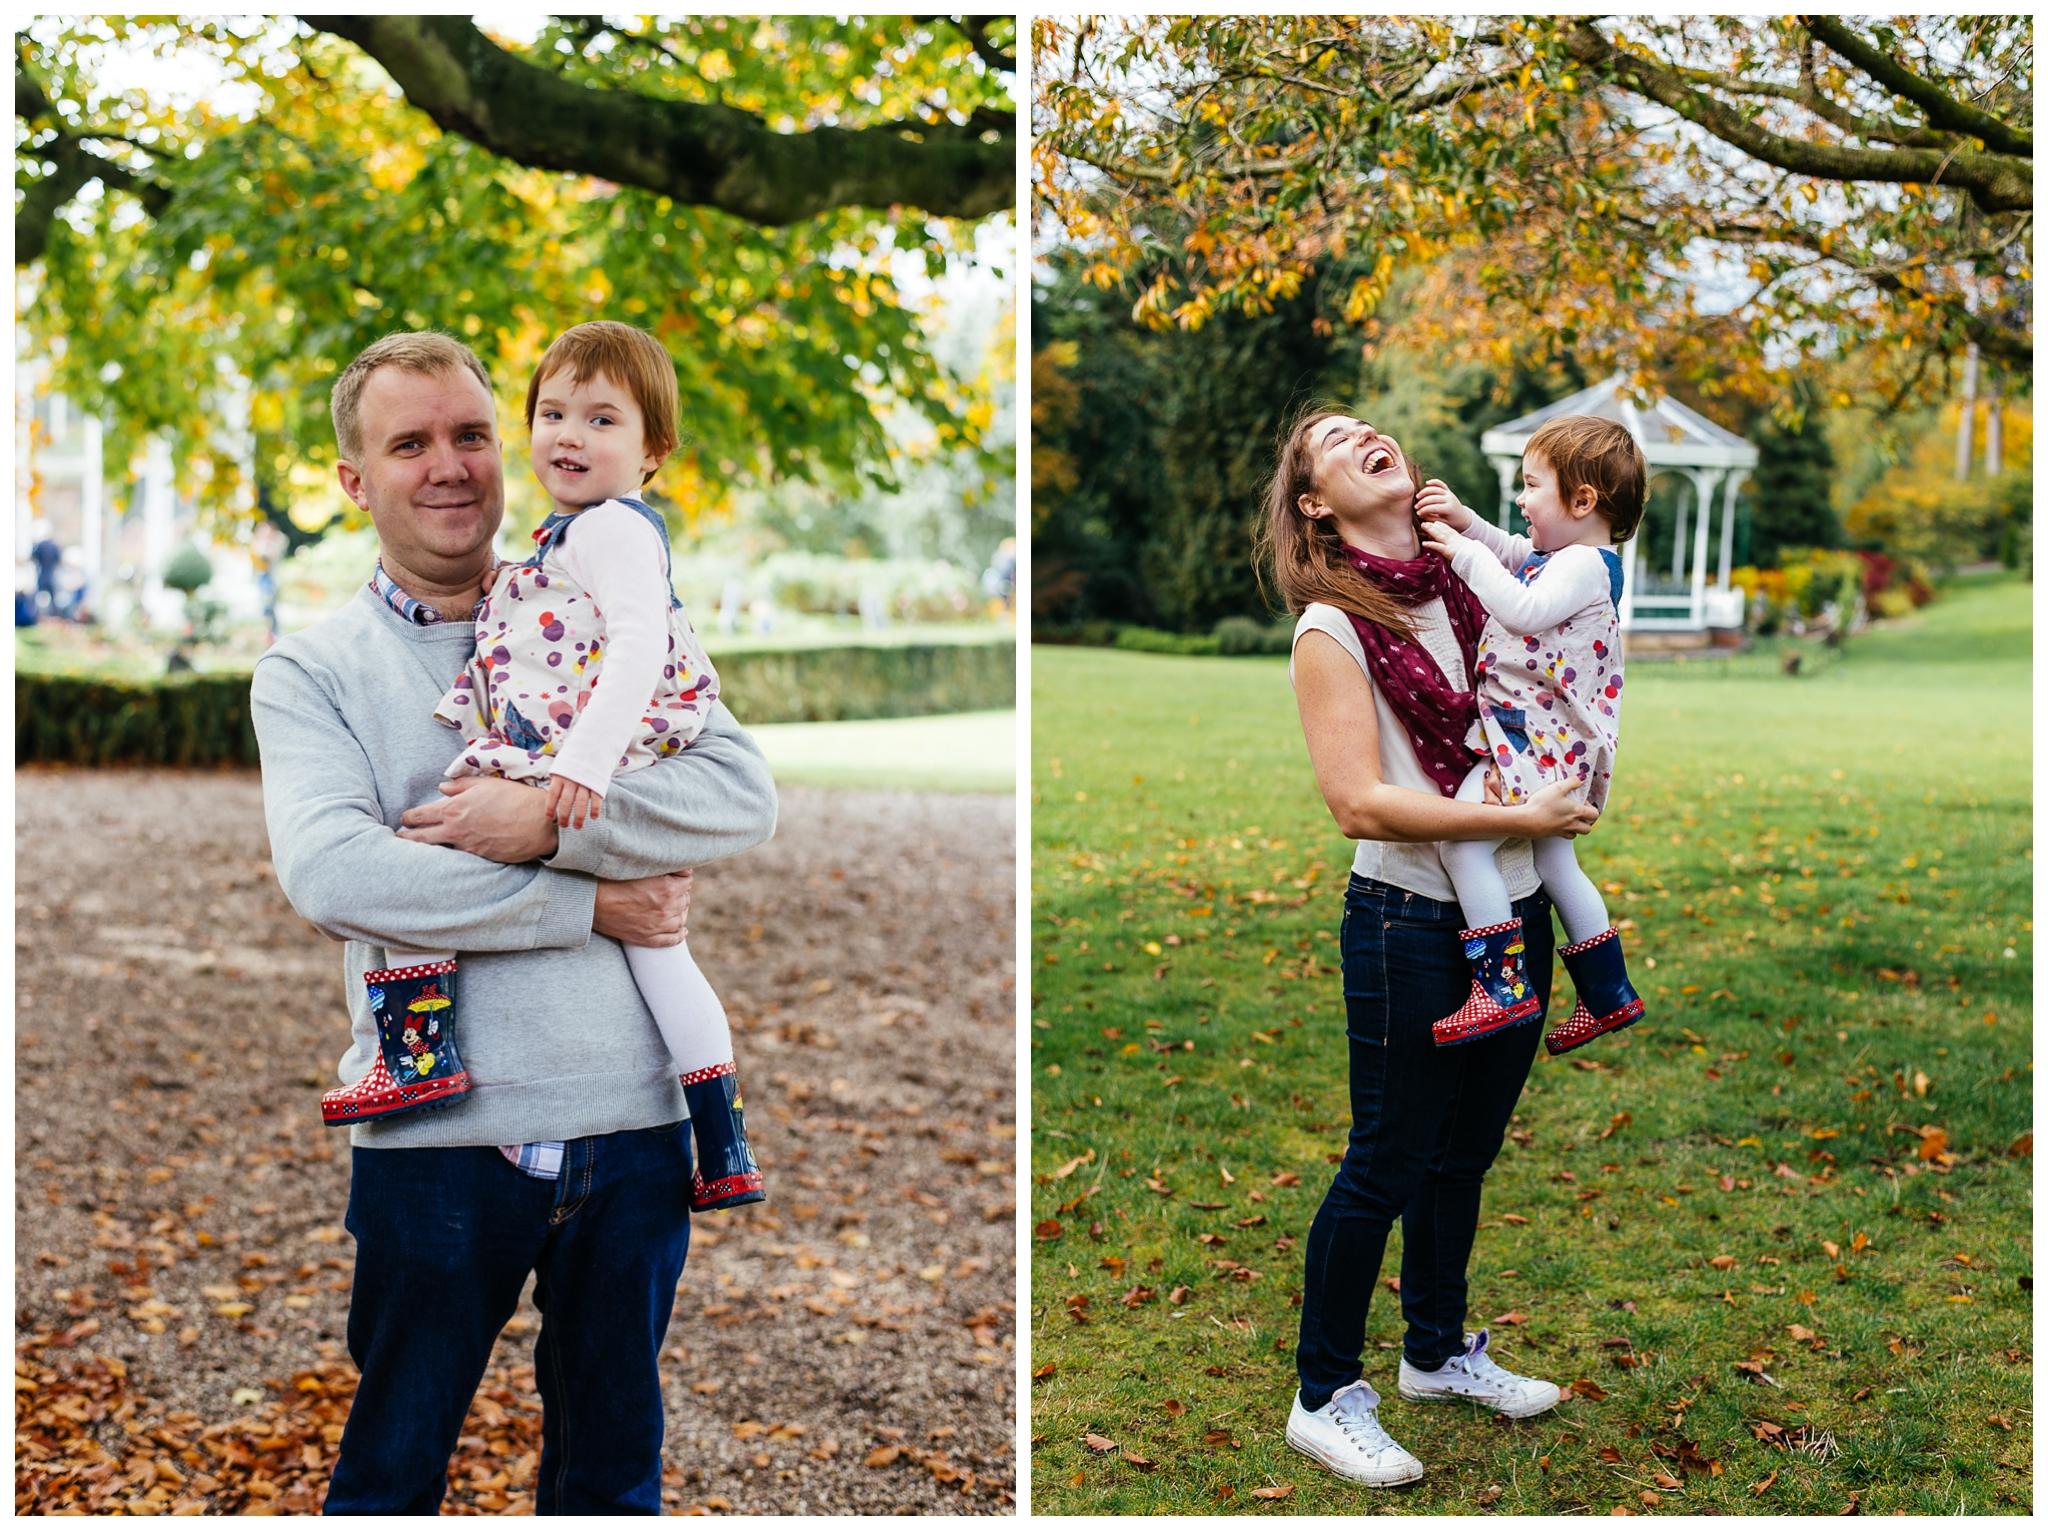 Autumn-family-portraits-birmingham-photographer_0026.jpg